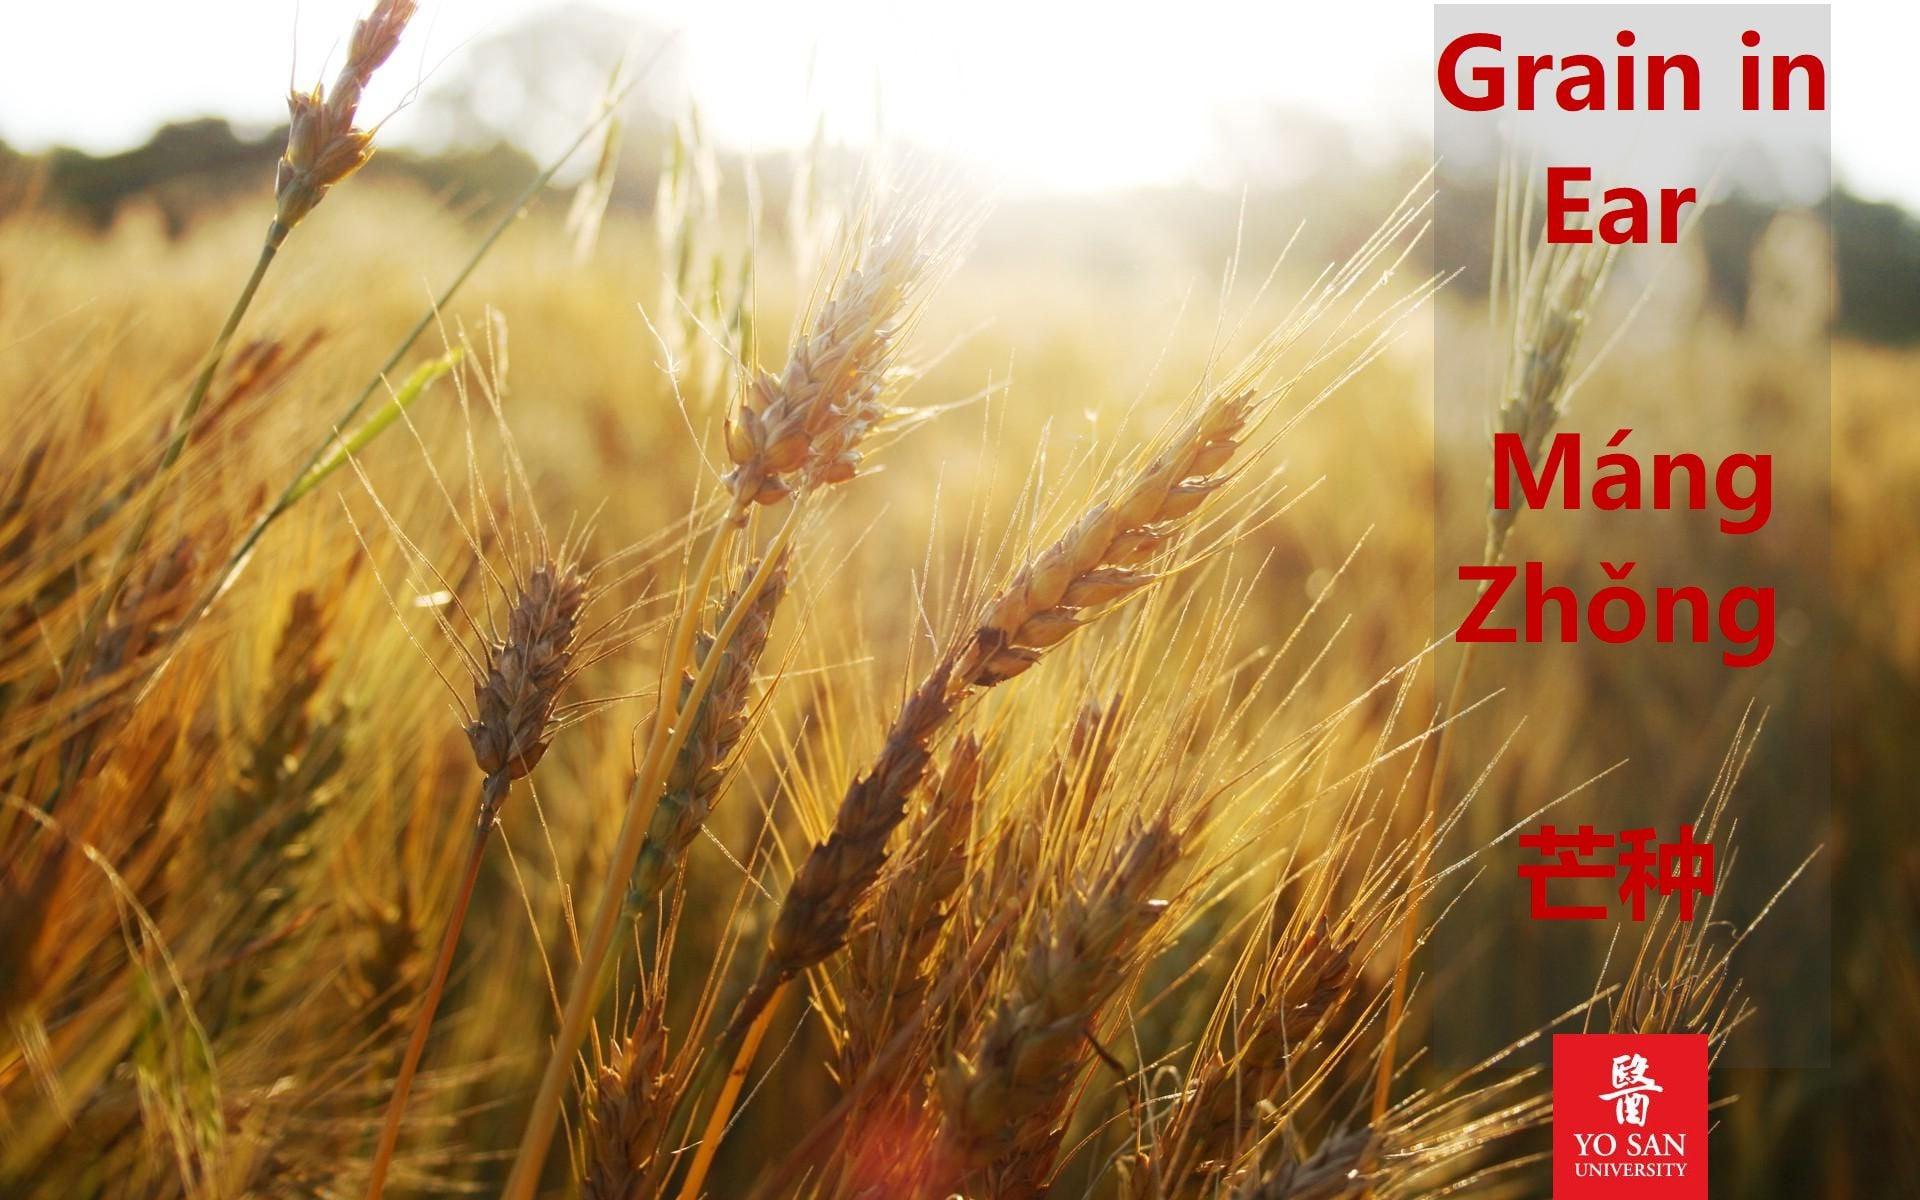 Grain in Ear 芒种 Máng Zhǒng